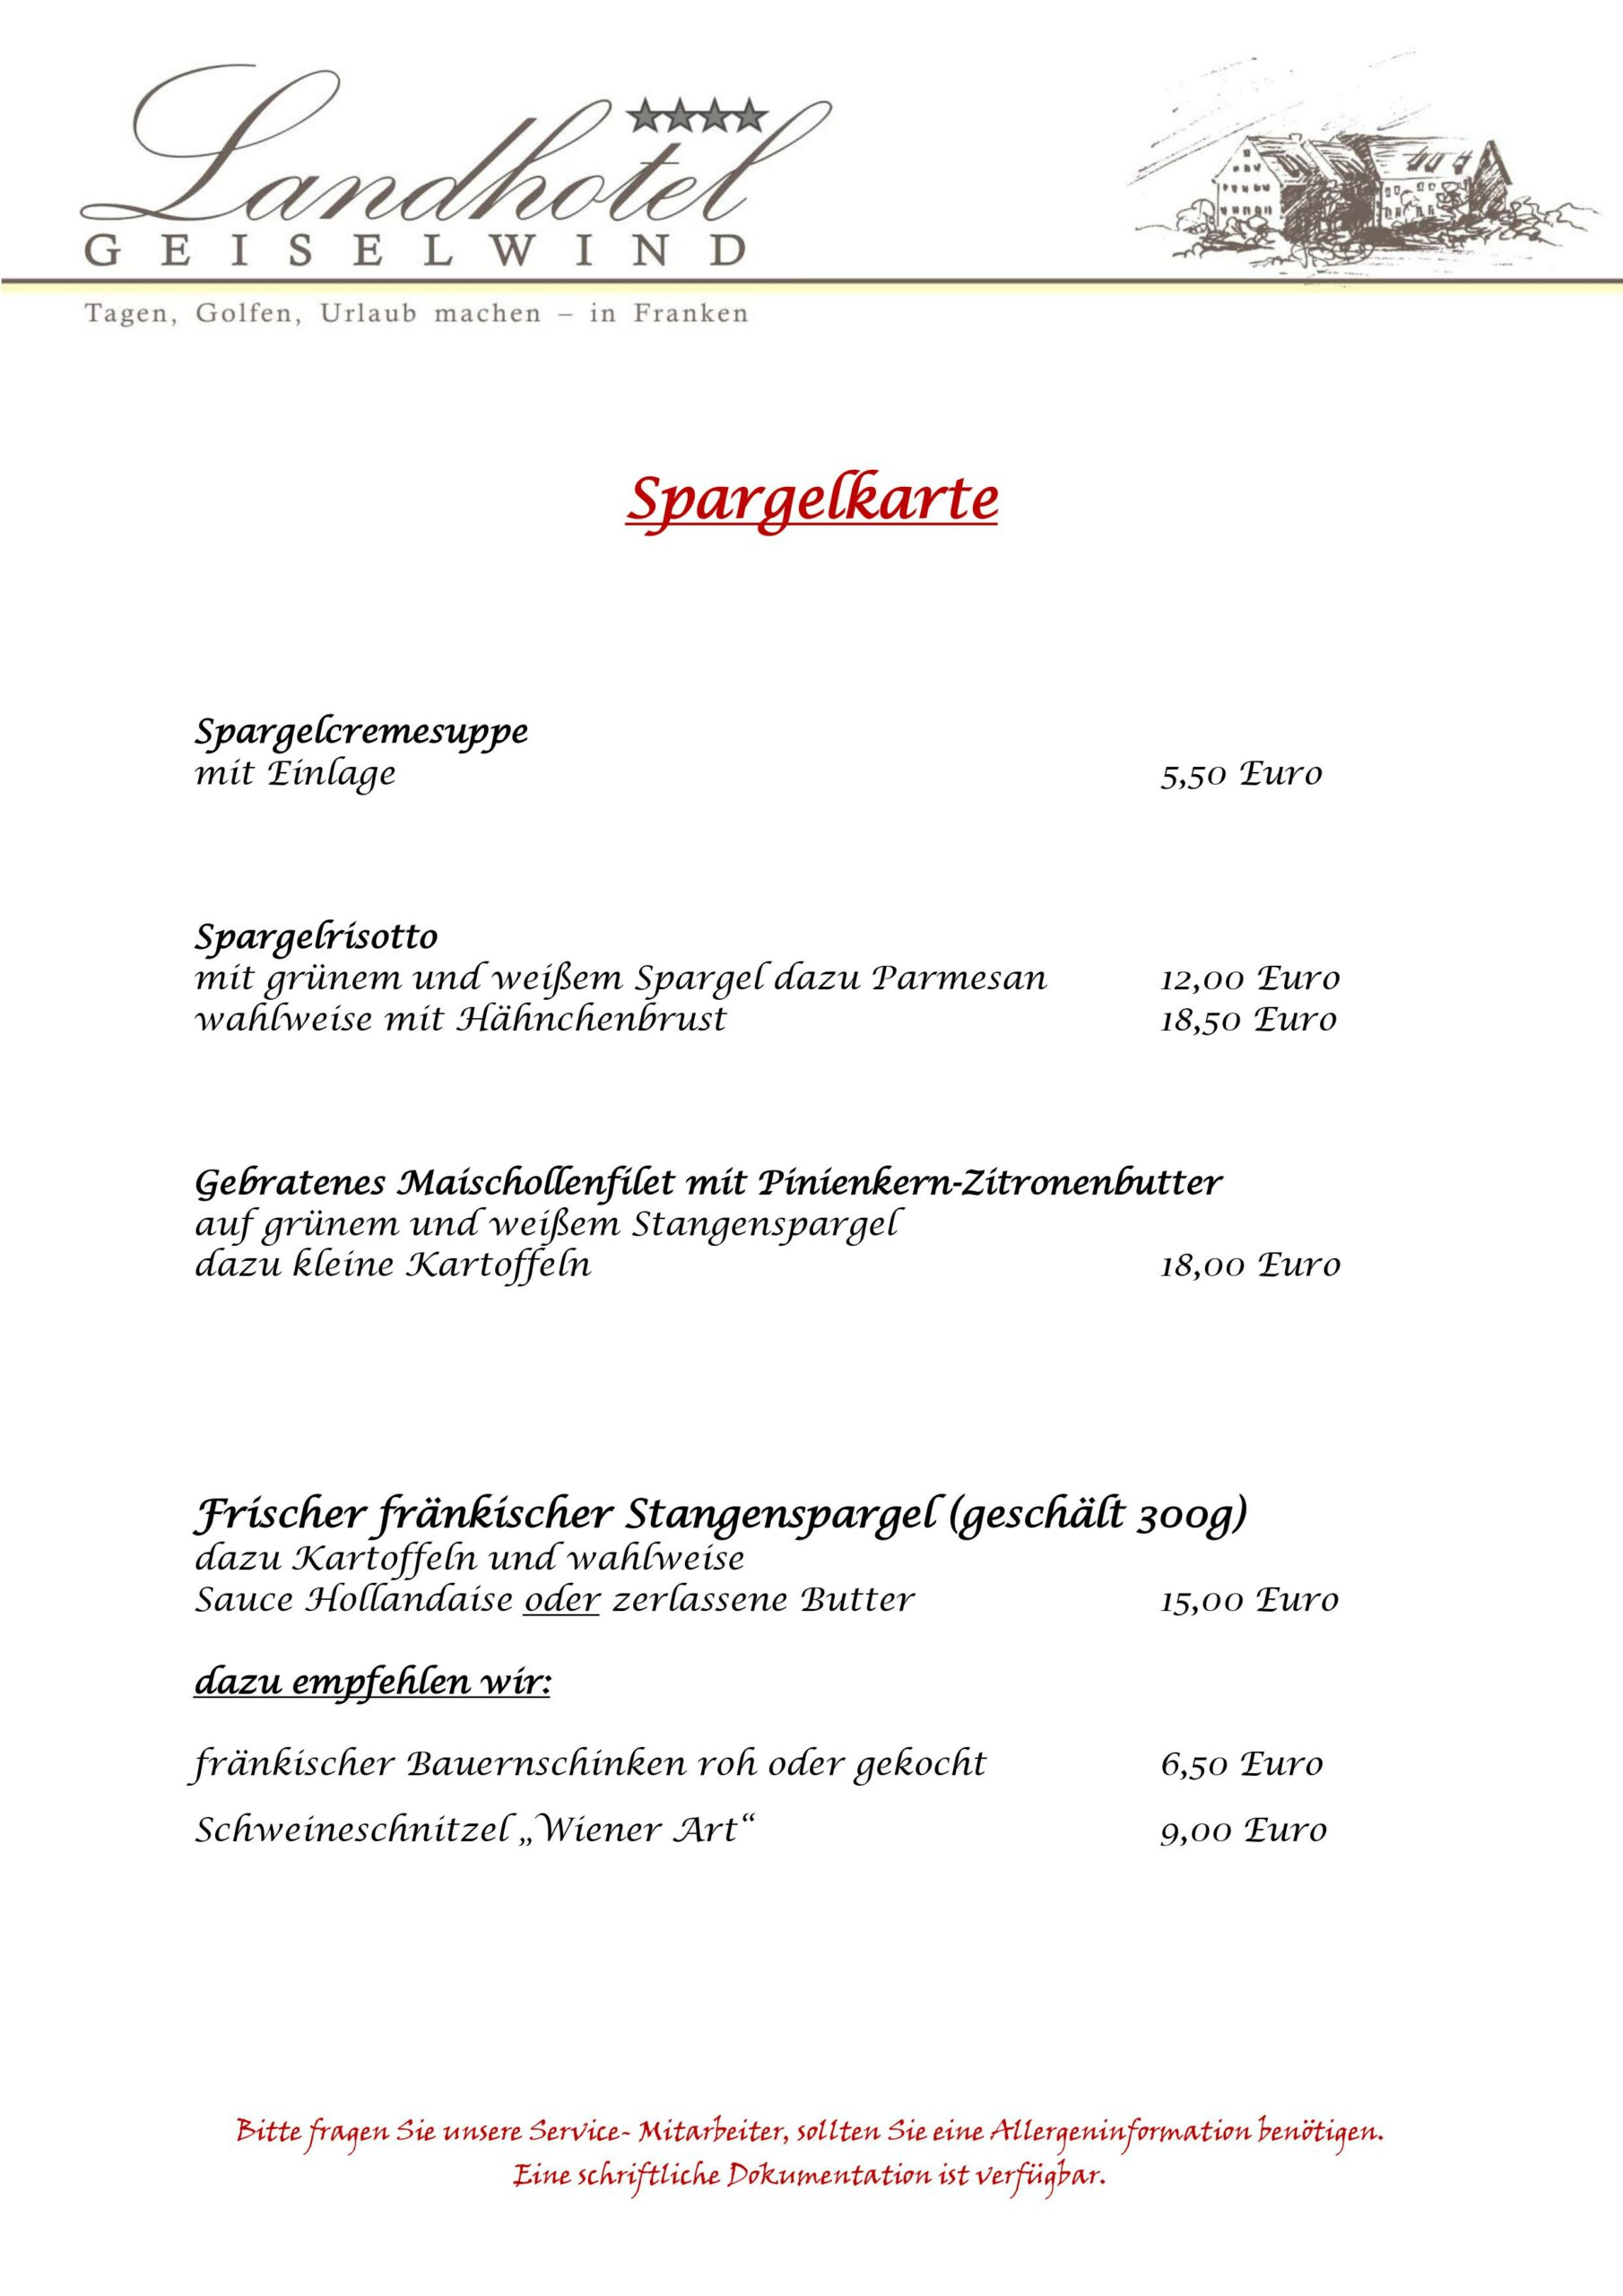 Spargelkarte Landhotel Geiselwind